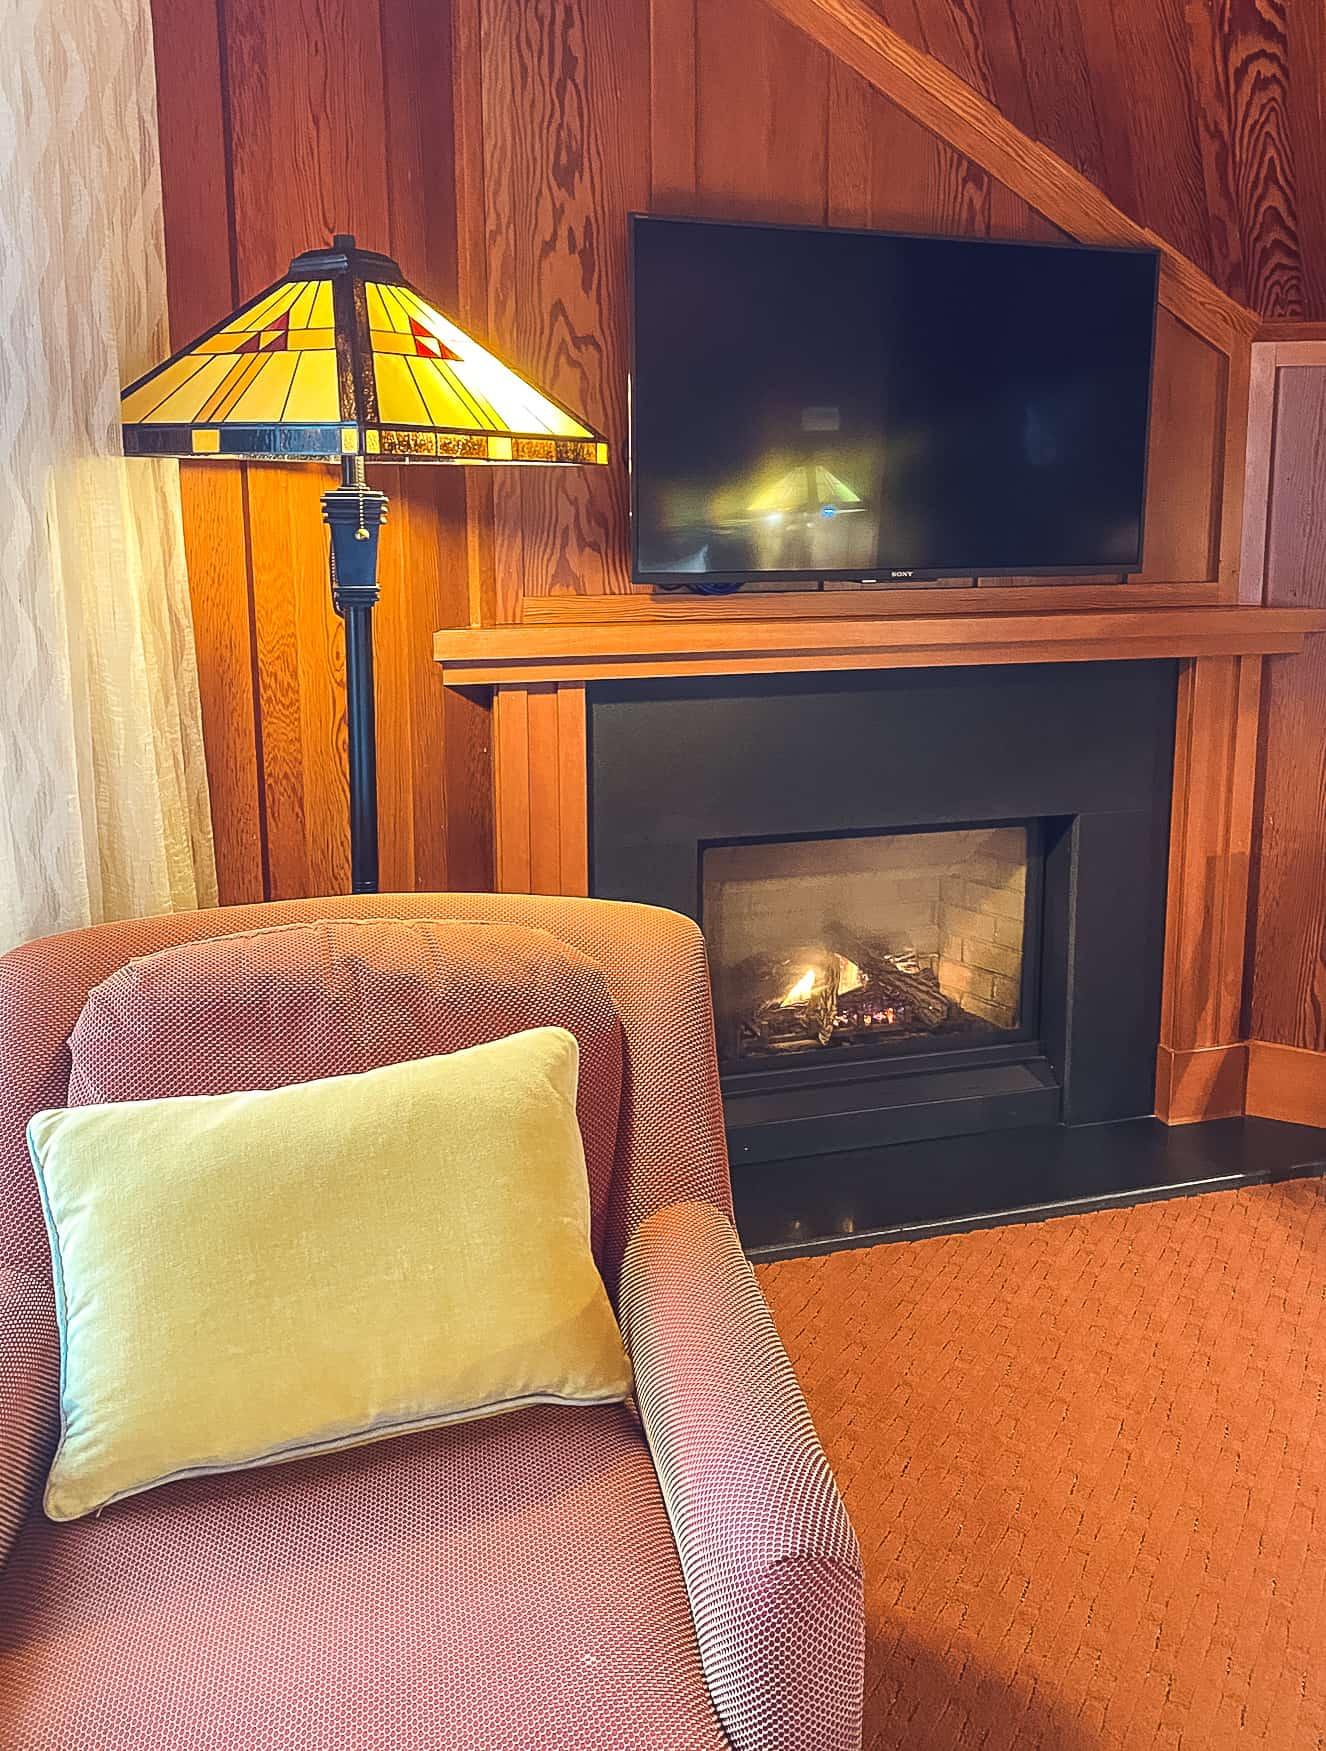 Noyo Harbor Inn - Fireplace